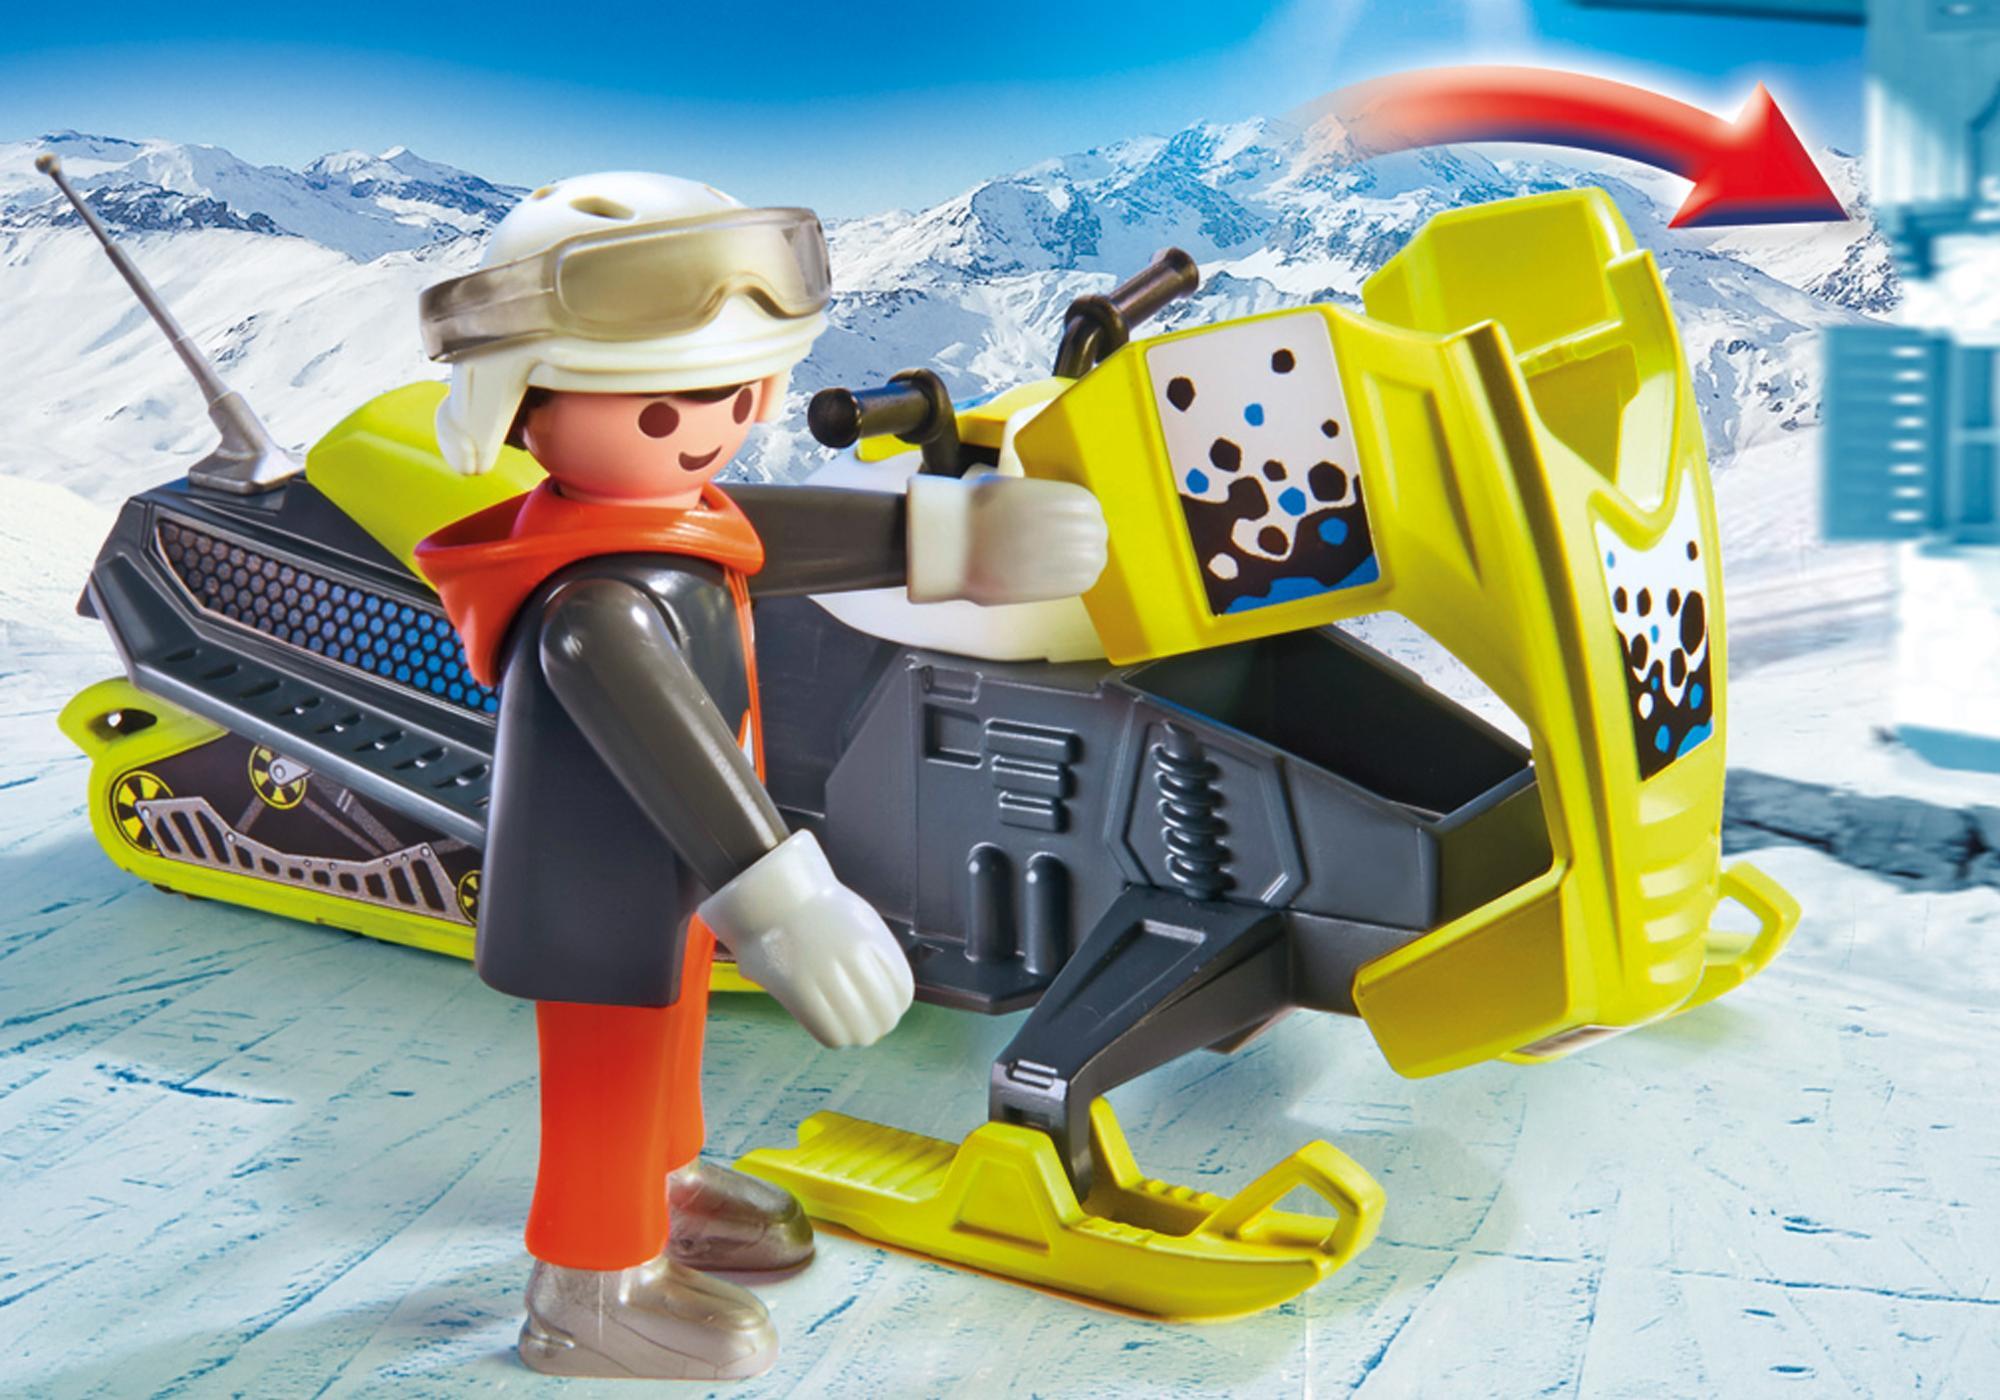 http://media.playmobil.com/i/playmobil/9285_product_extra1/Skuter śnieżny